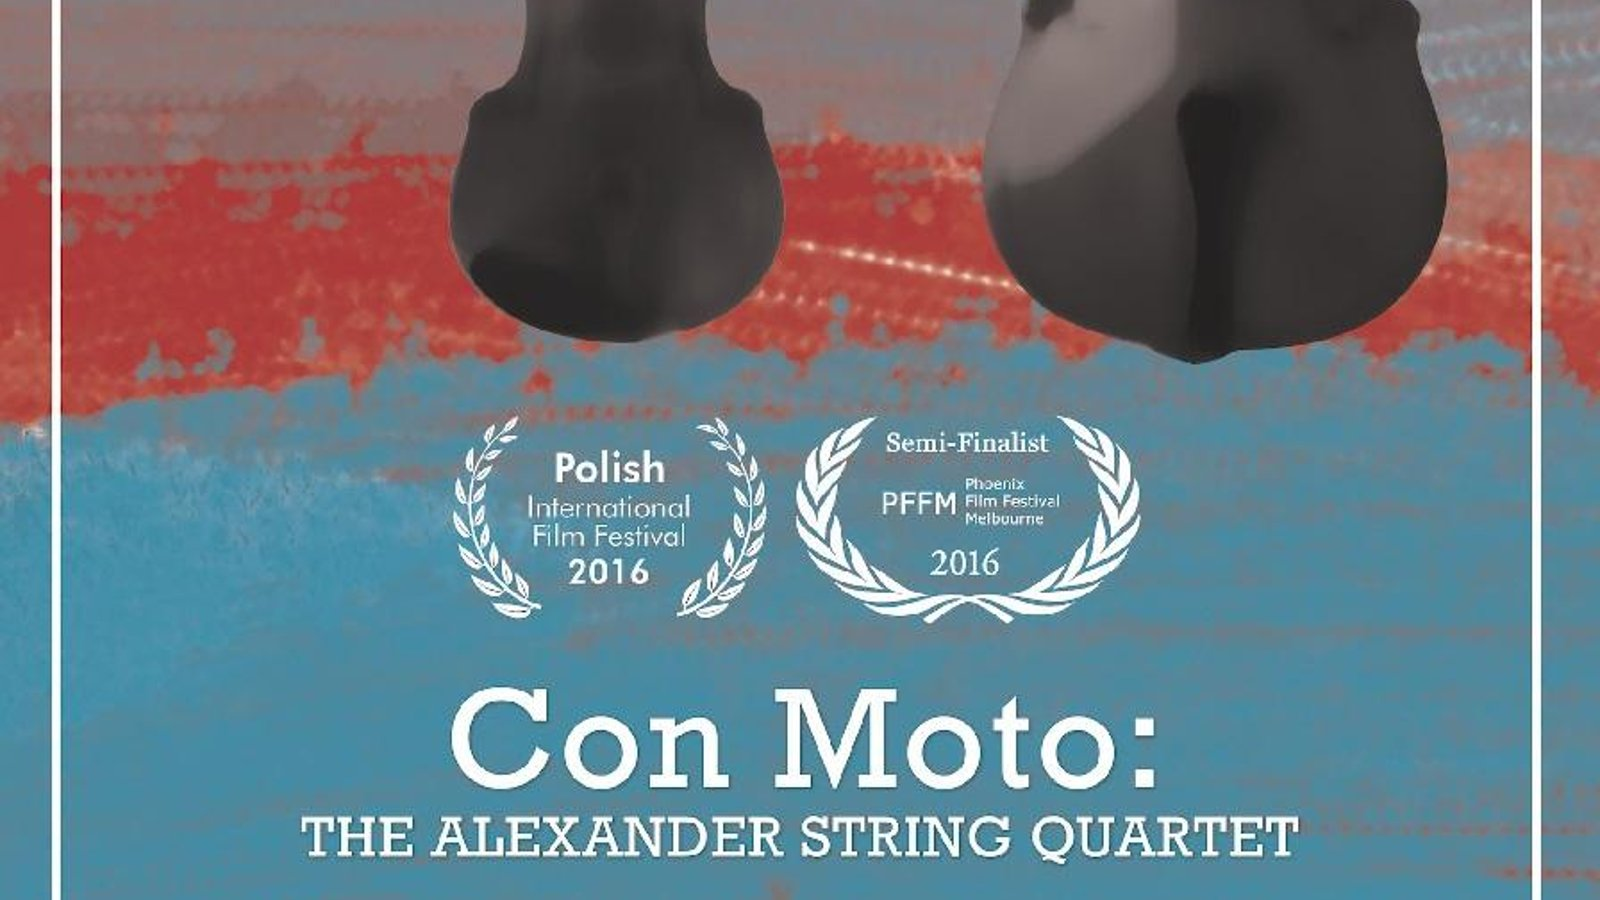 Con Moto - The Alexander String Quartet